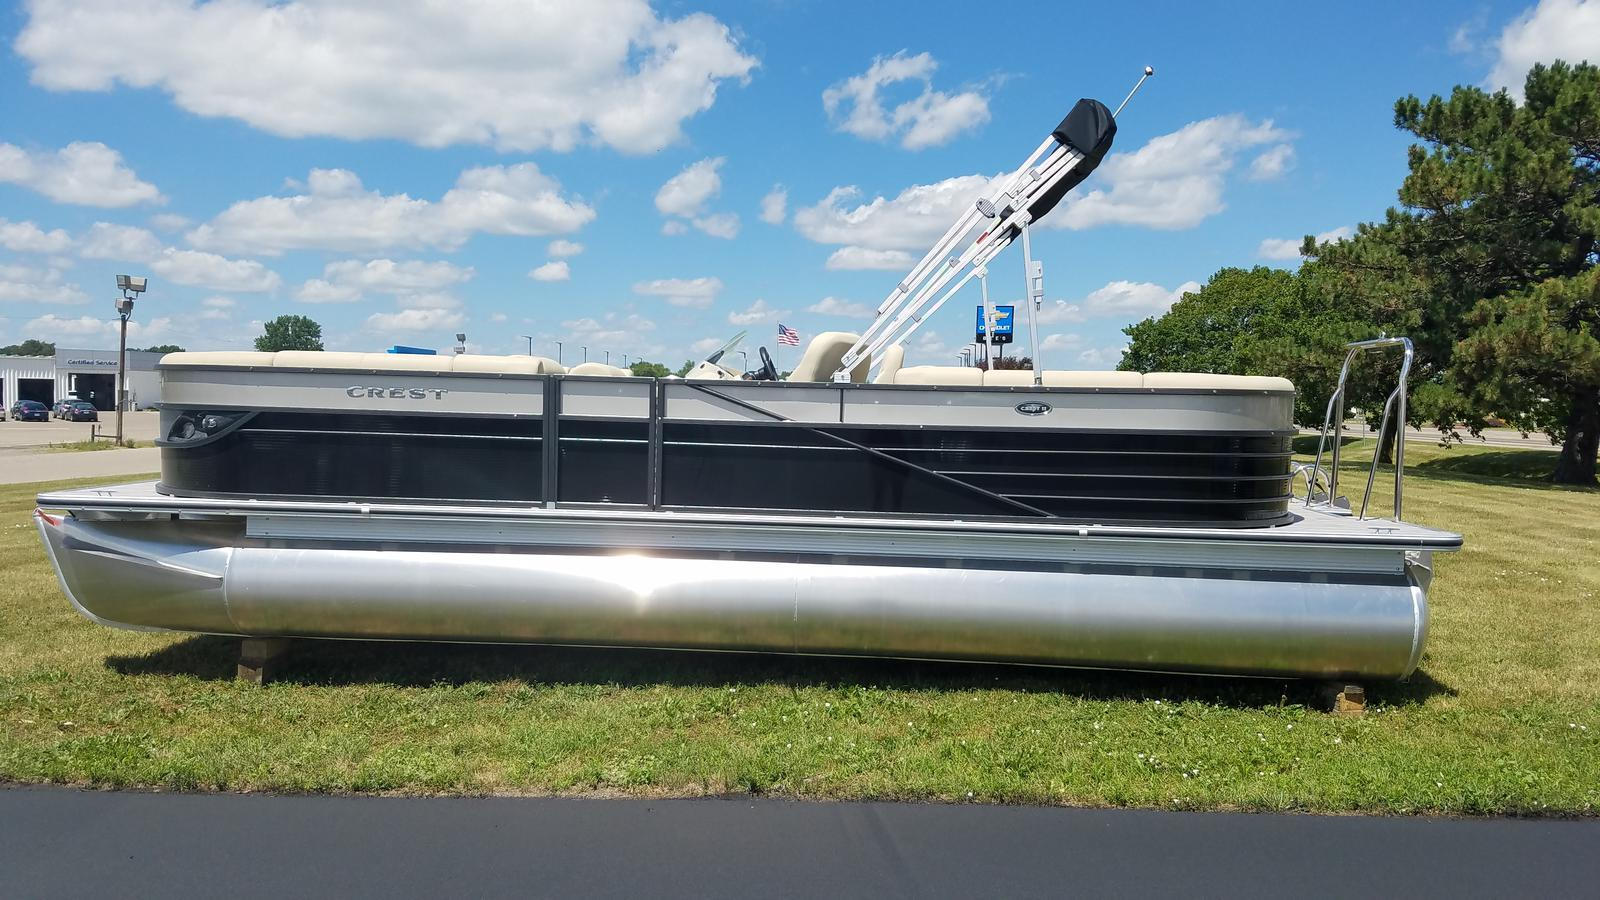 Crest Pontoon Boats Crest II 250 SLC CP3